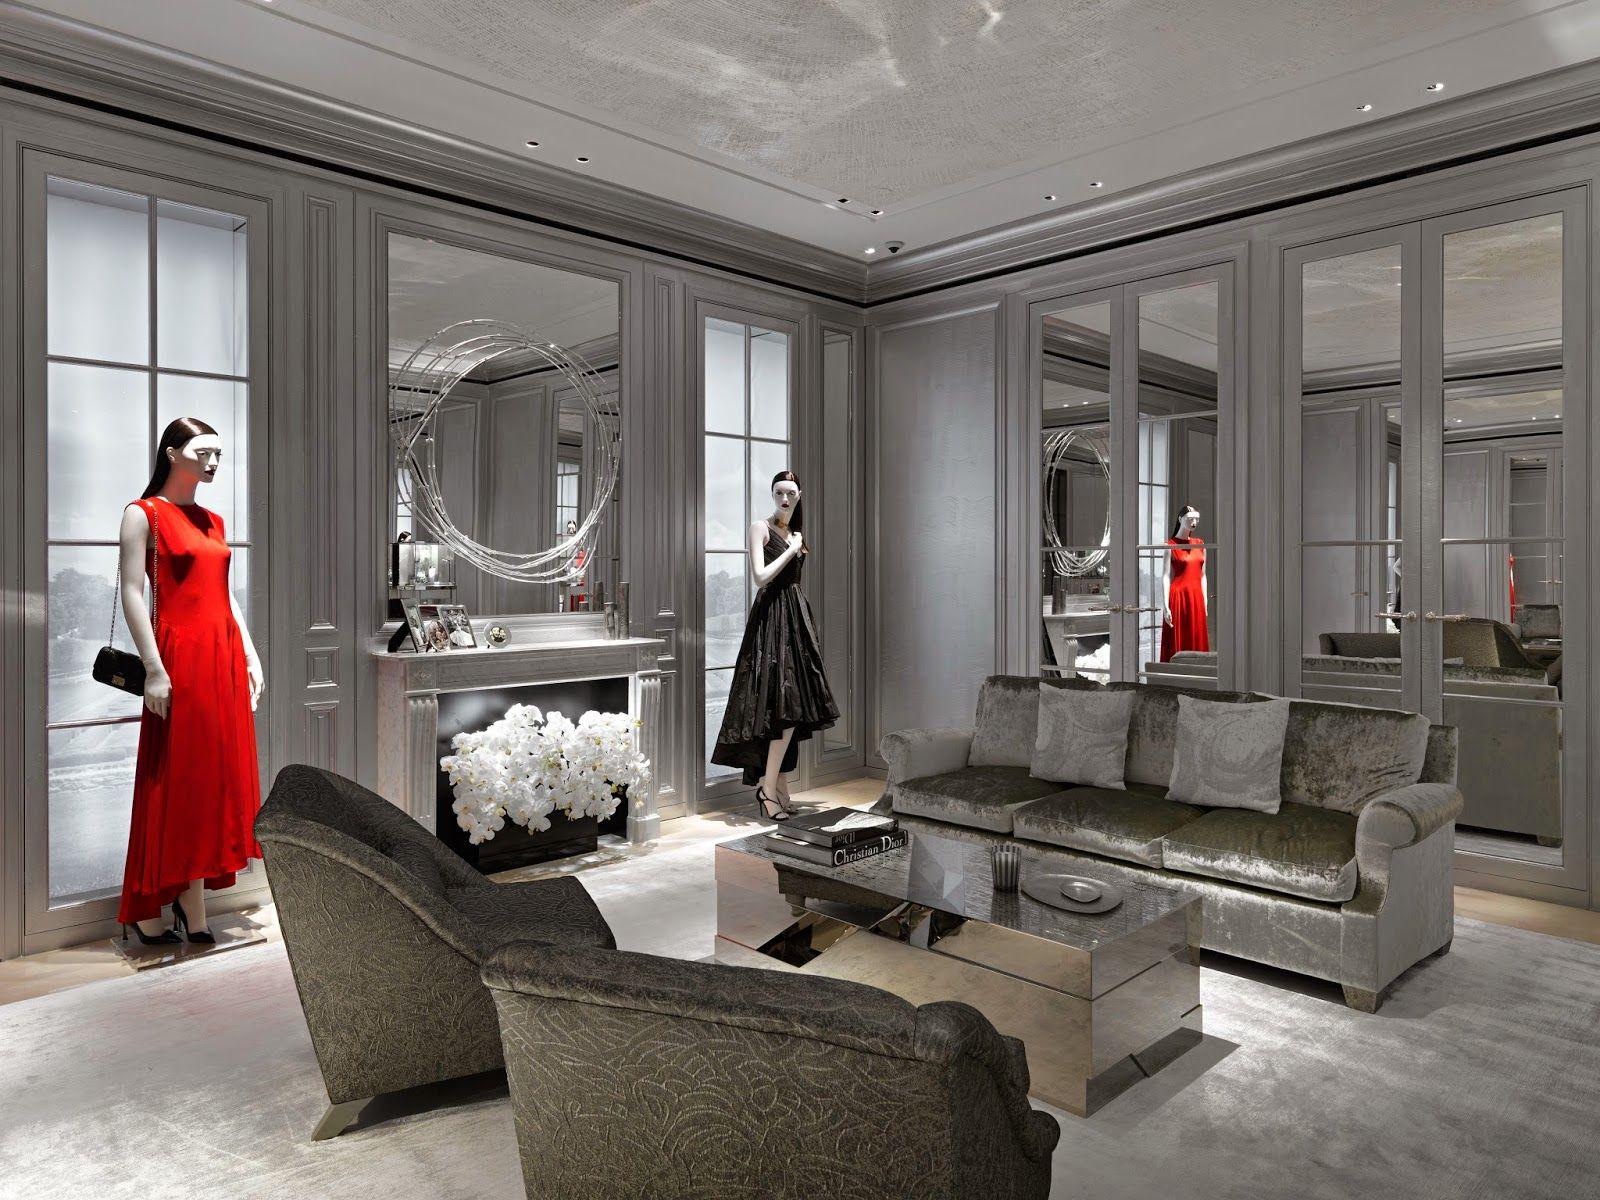 Dior boutique interior google search wood spring for Interior design web app